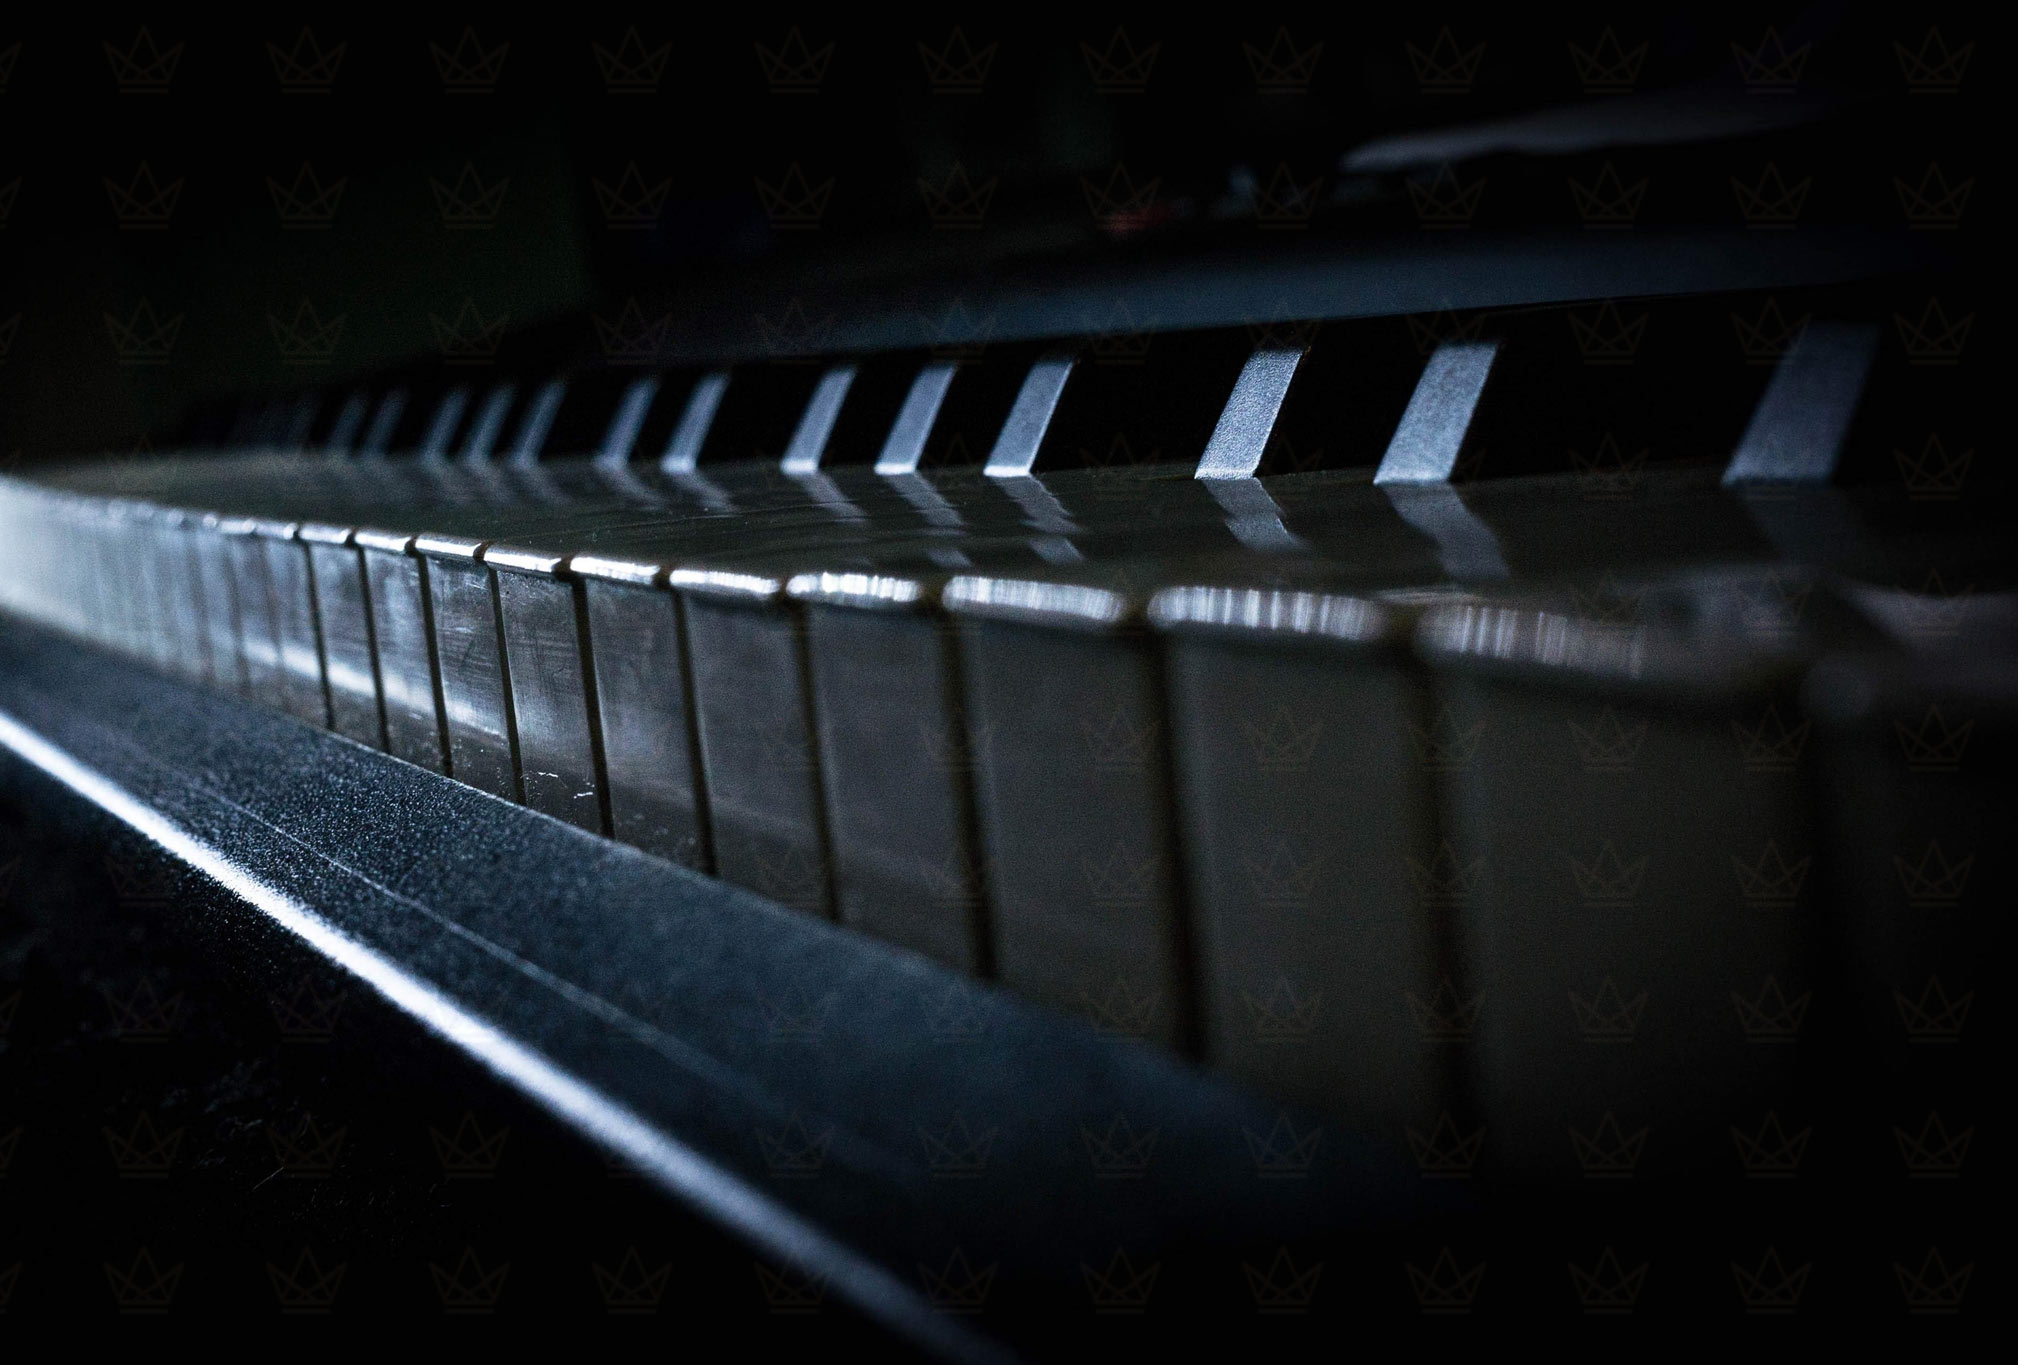 piano keys with classic piano repairs logo watermarked